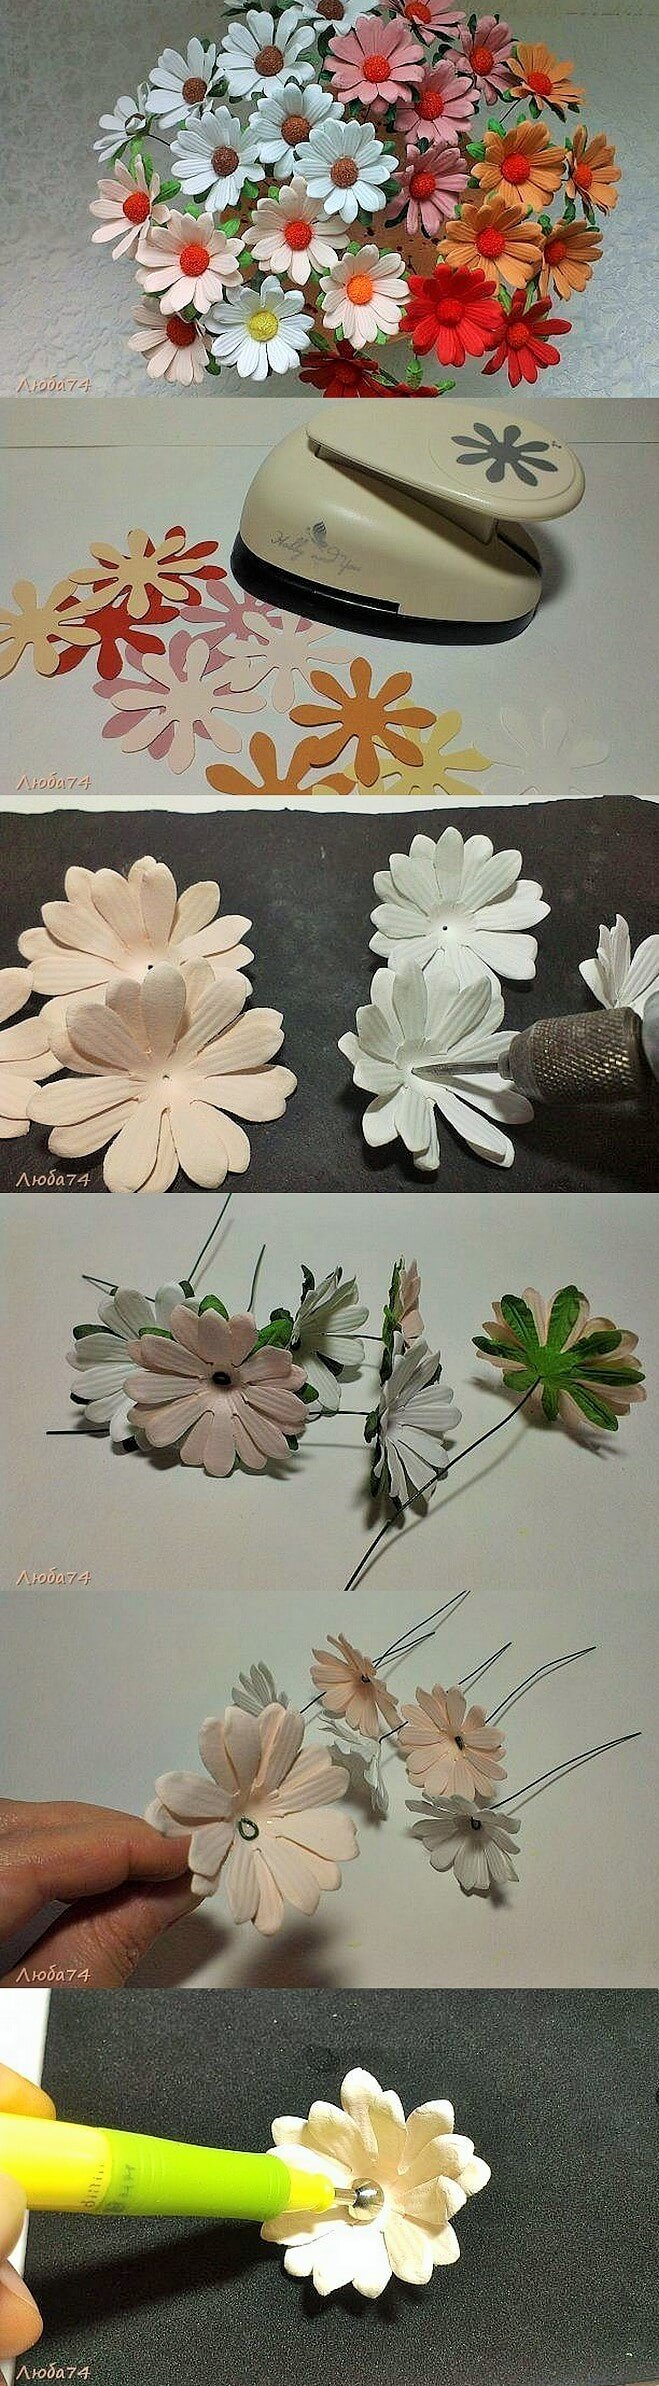 Homemade crafts Ideas-6